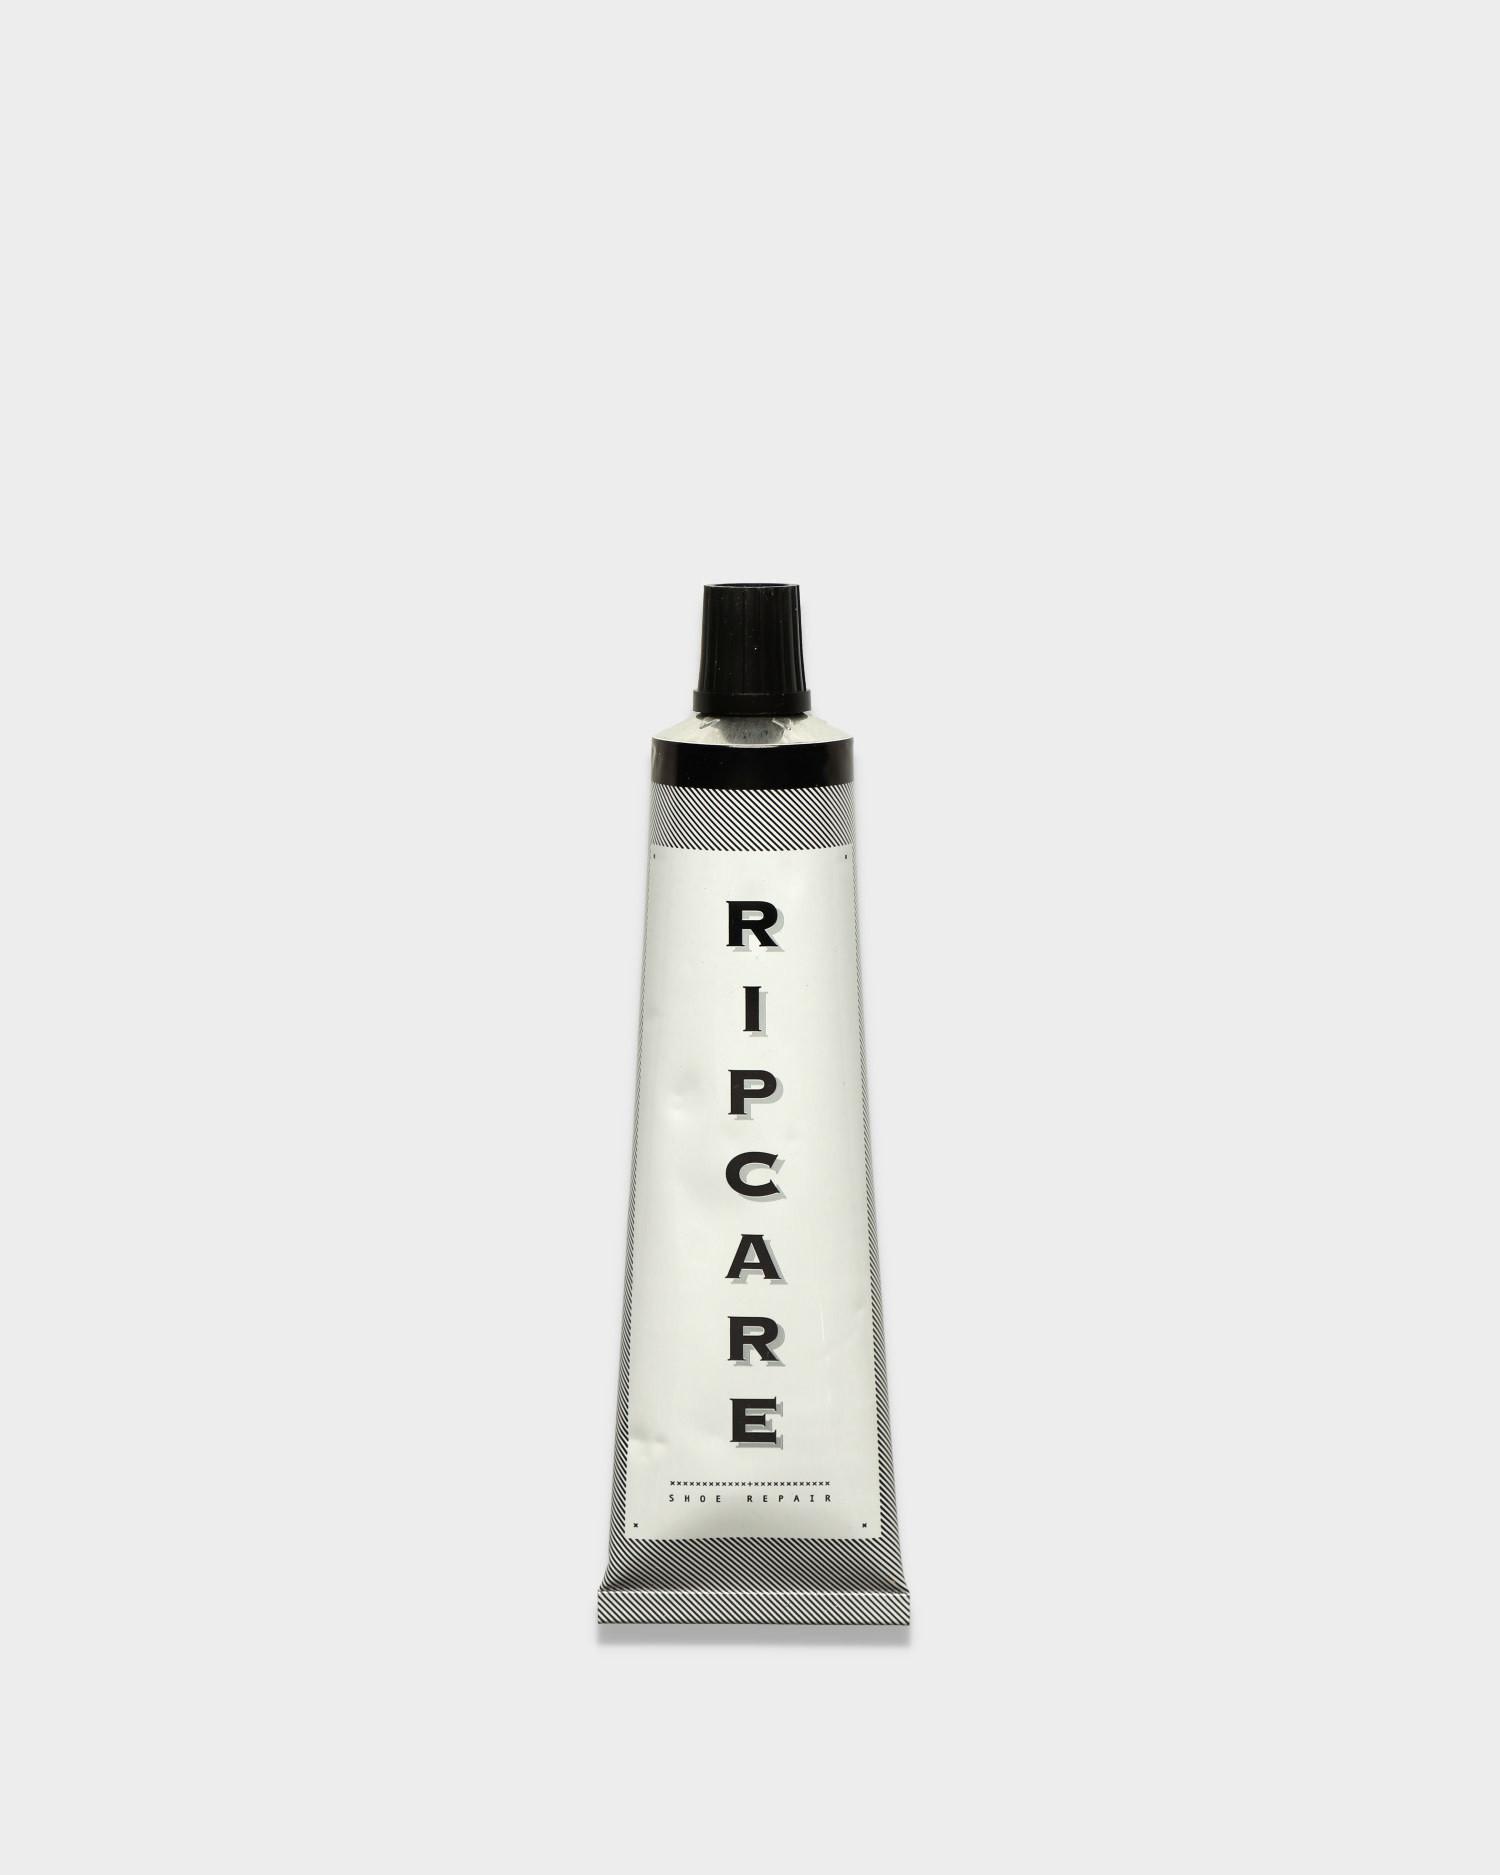 Ripcare Shoe Repair Glue Black